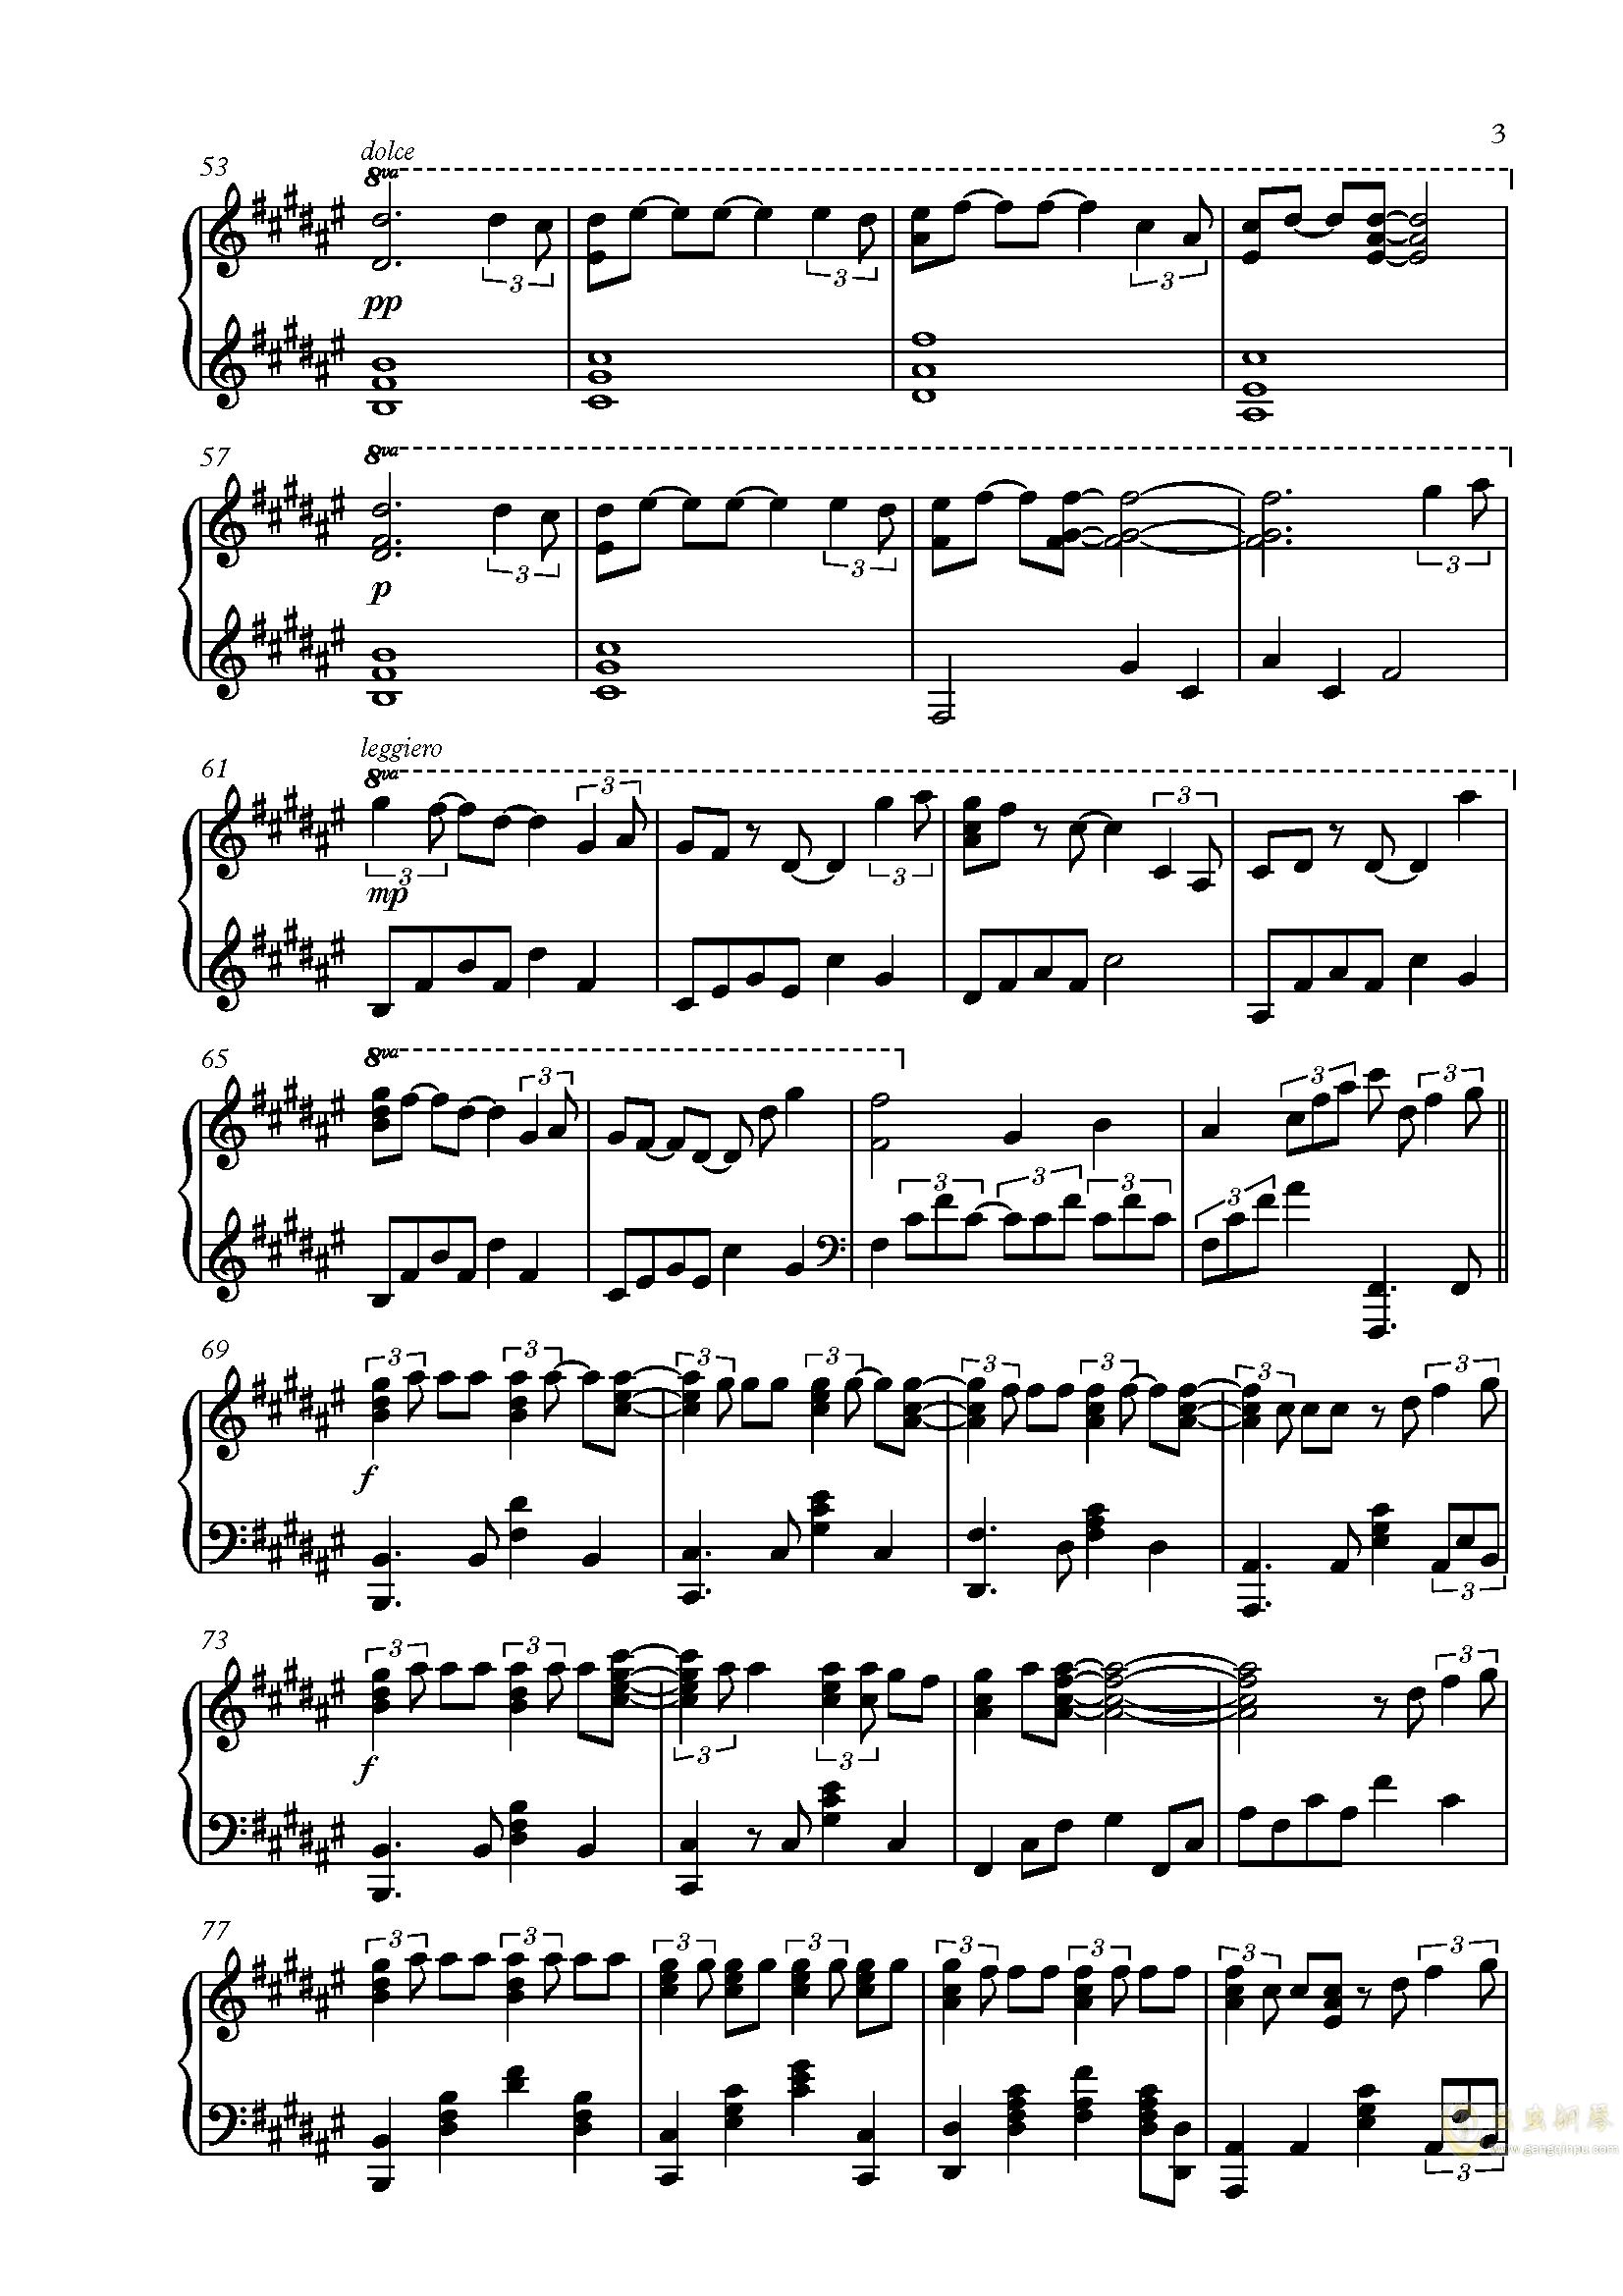 Secret Base - Anohana ED 未闻花名/我们仍未知道那天所看见的花的名字钢琴谱 第3页